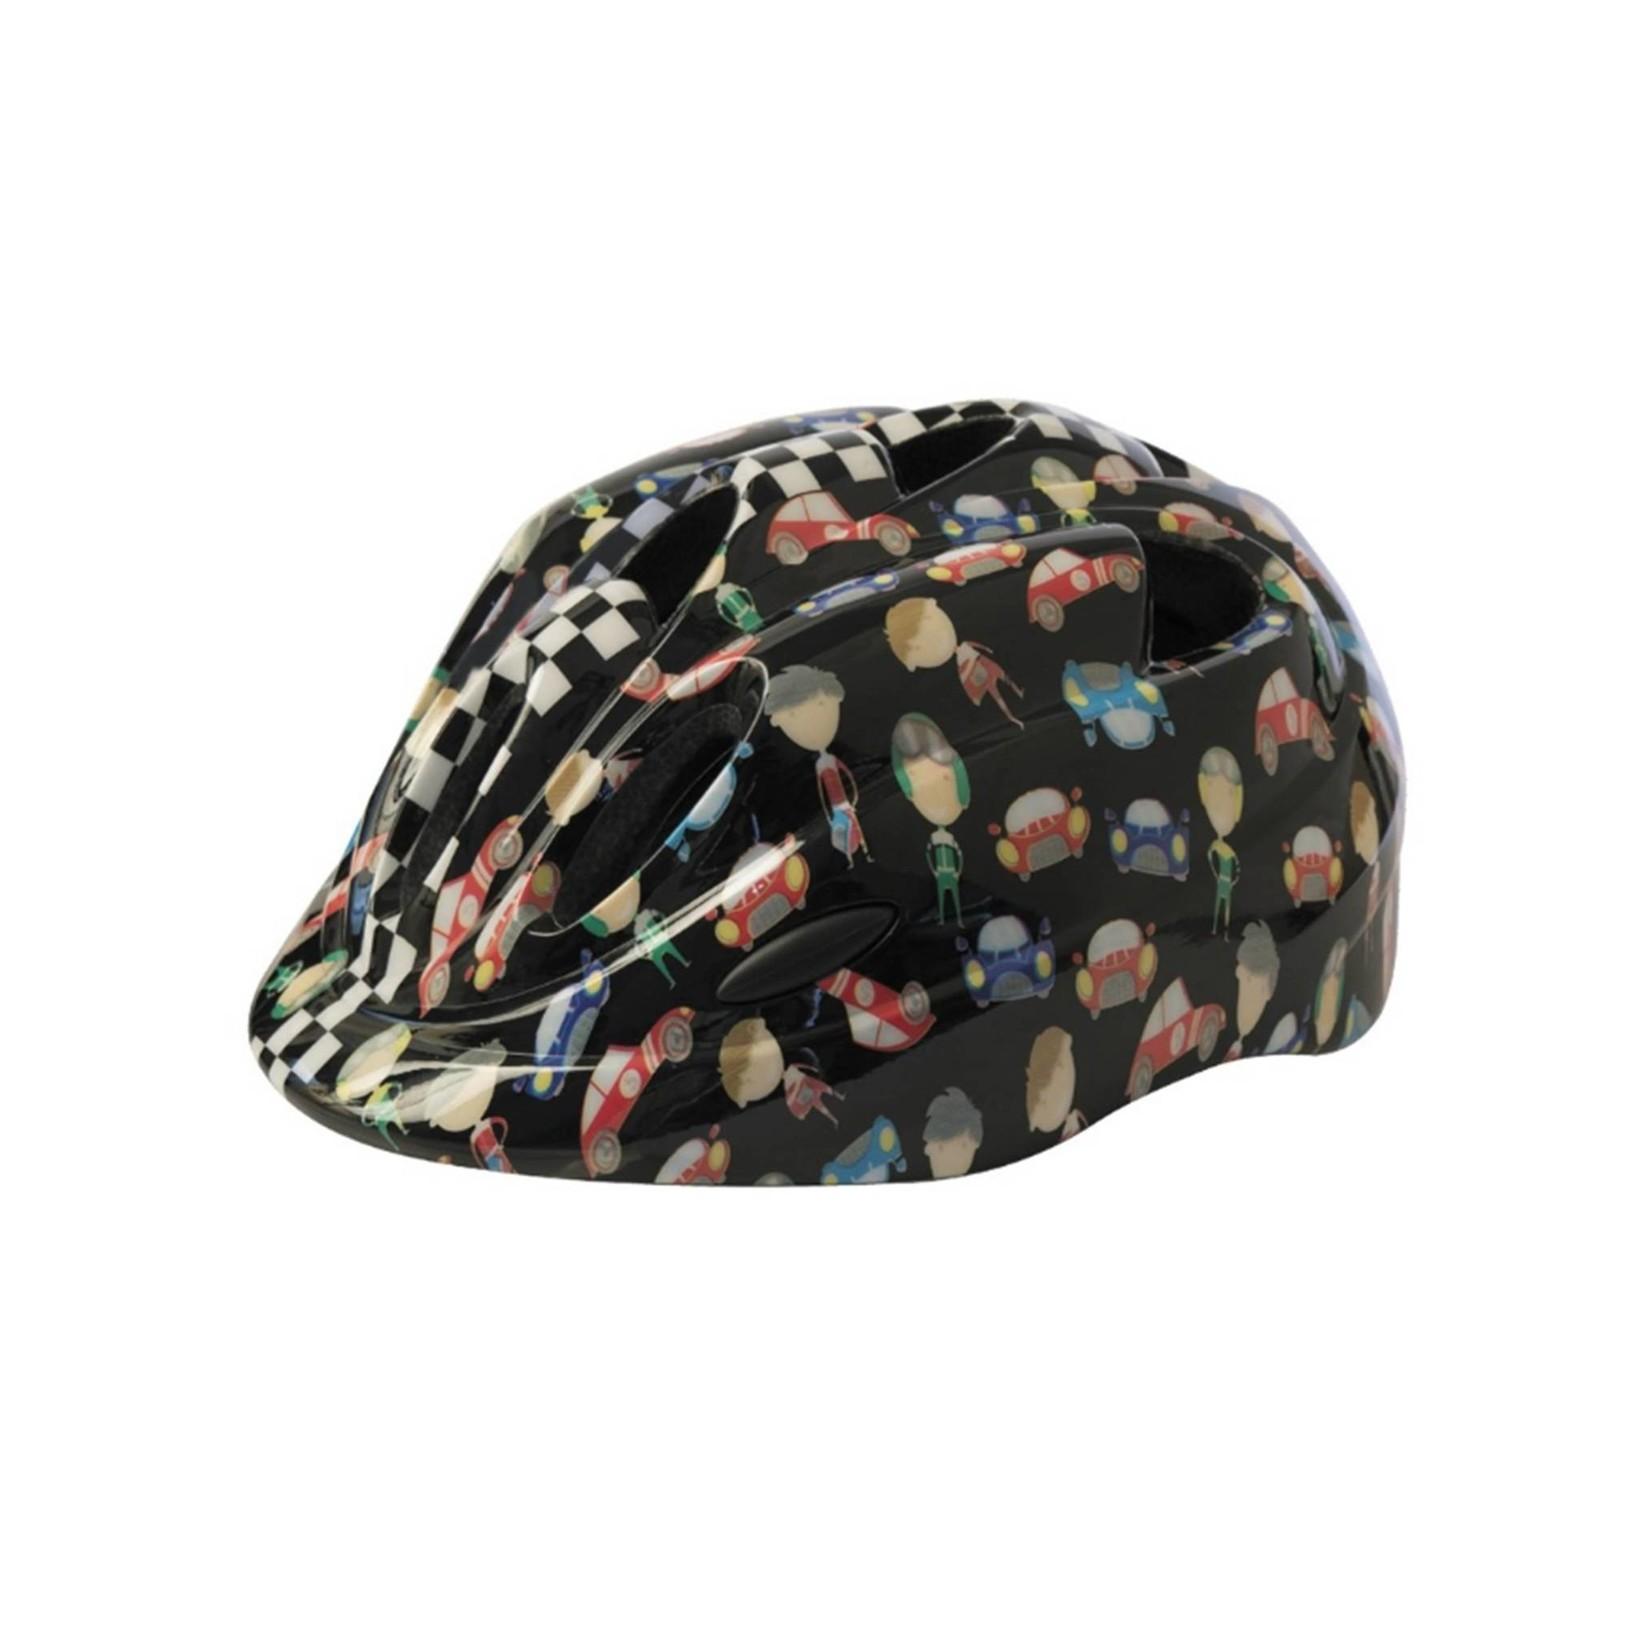 Azur Cars Kids Helmet